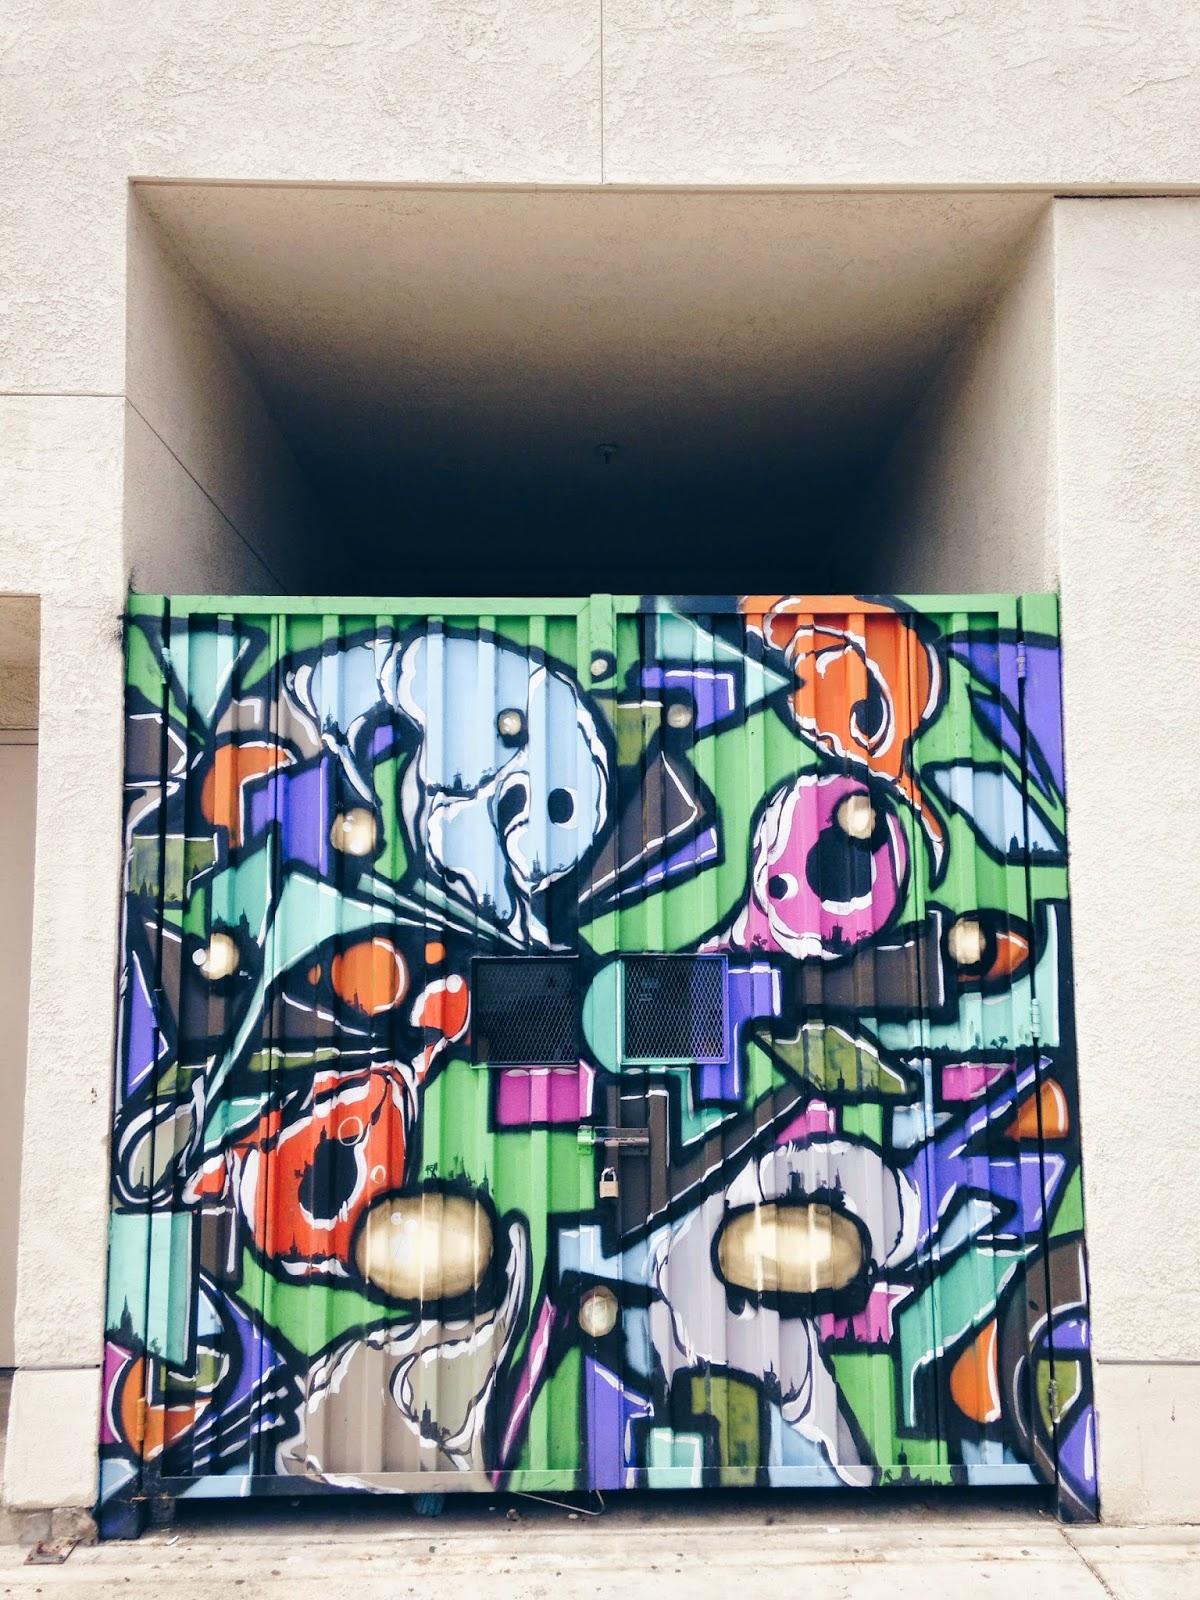 Courtney Tomesch Graffiti Street Art Santa Ana California